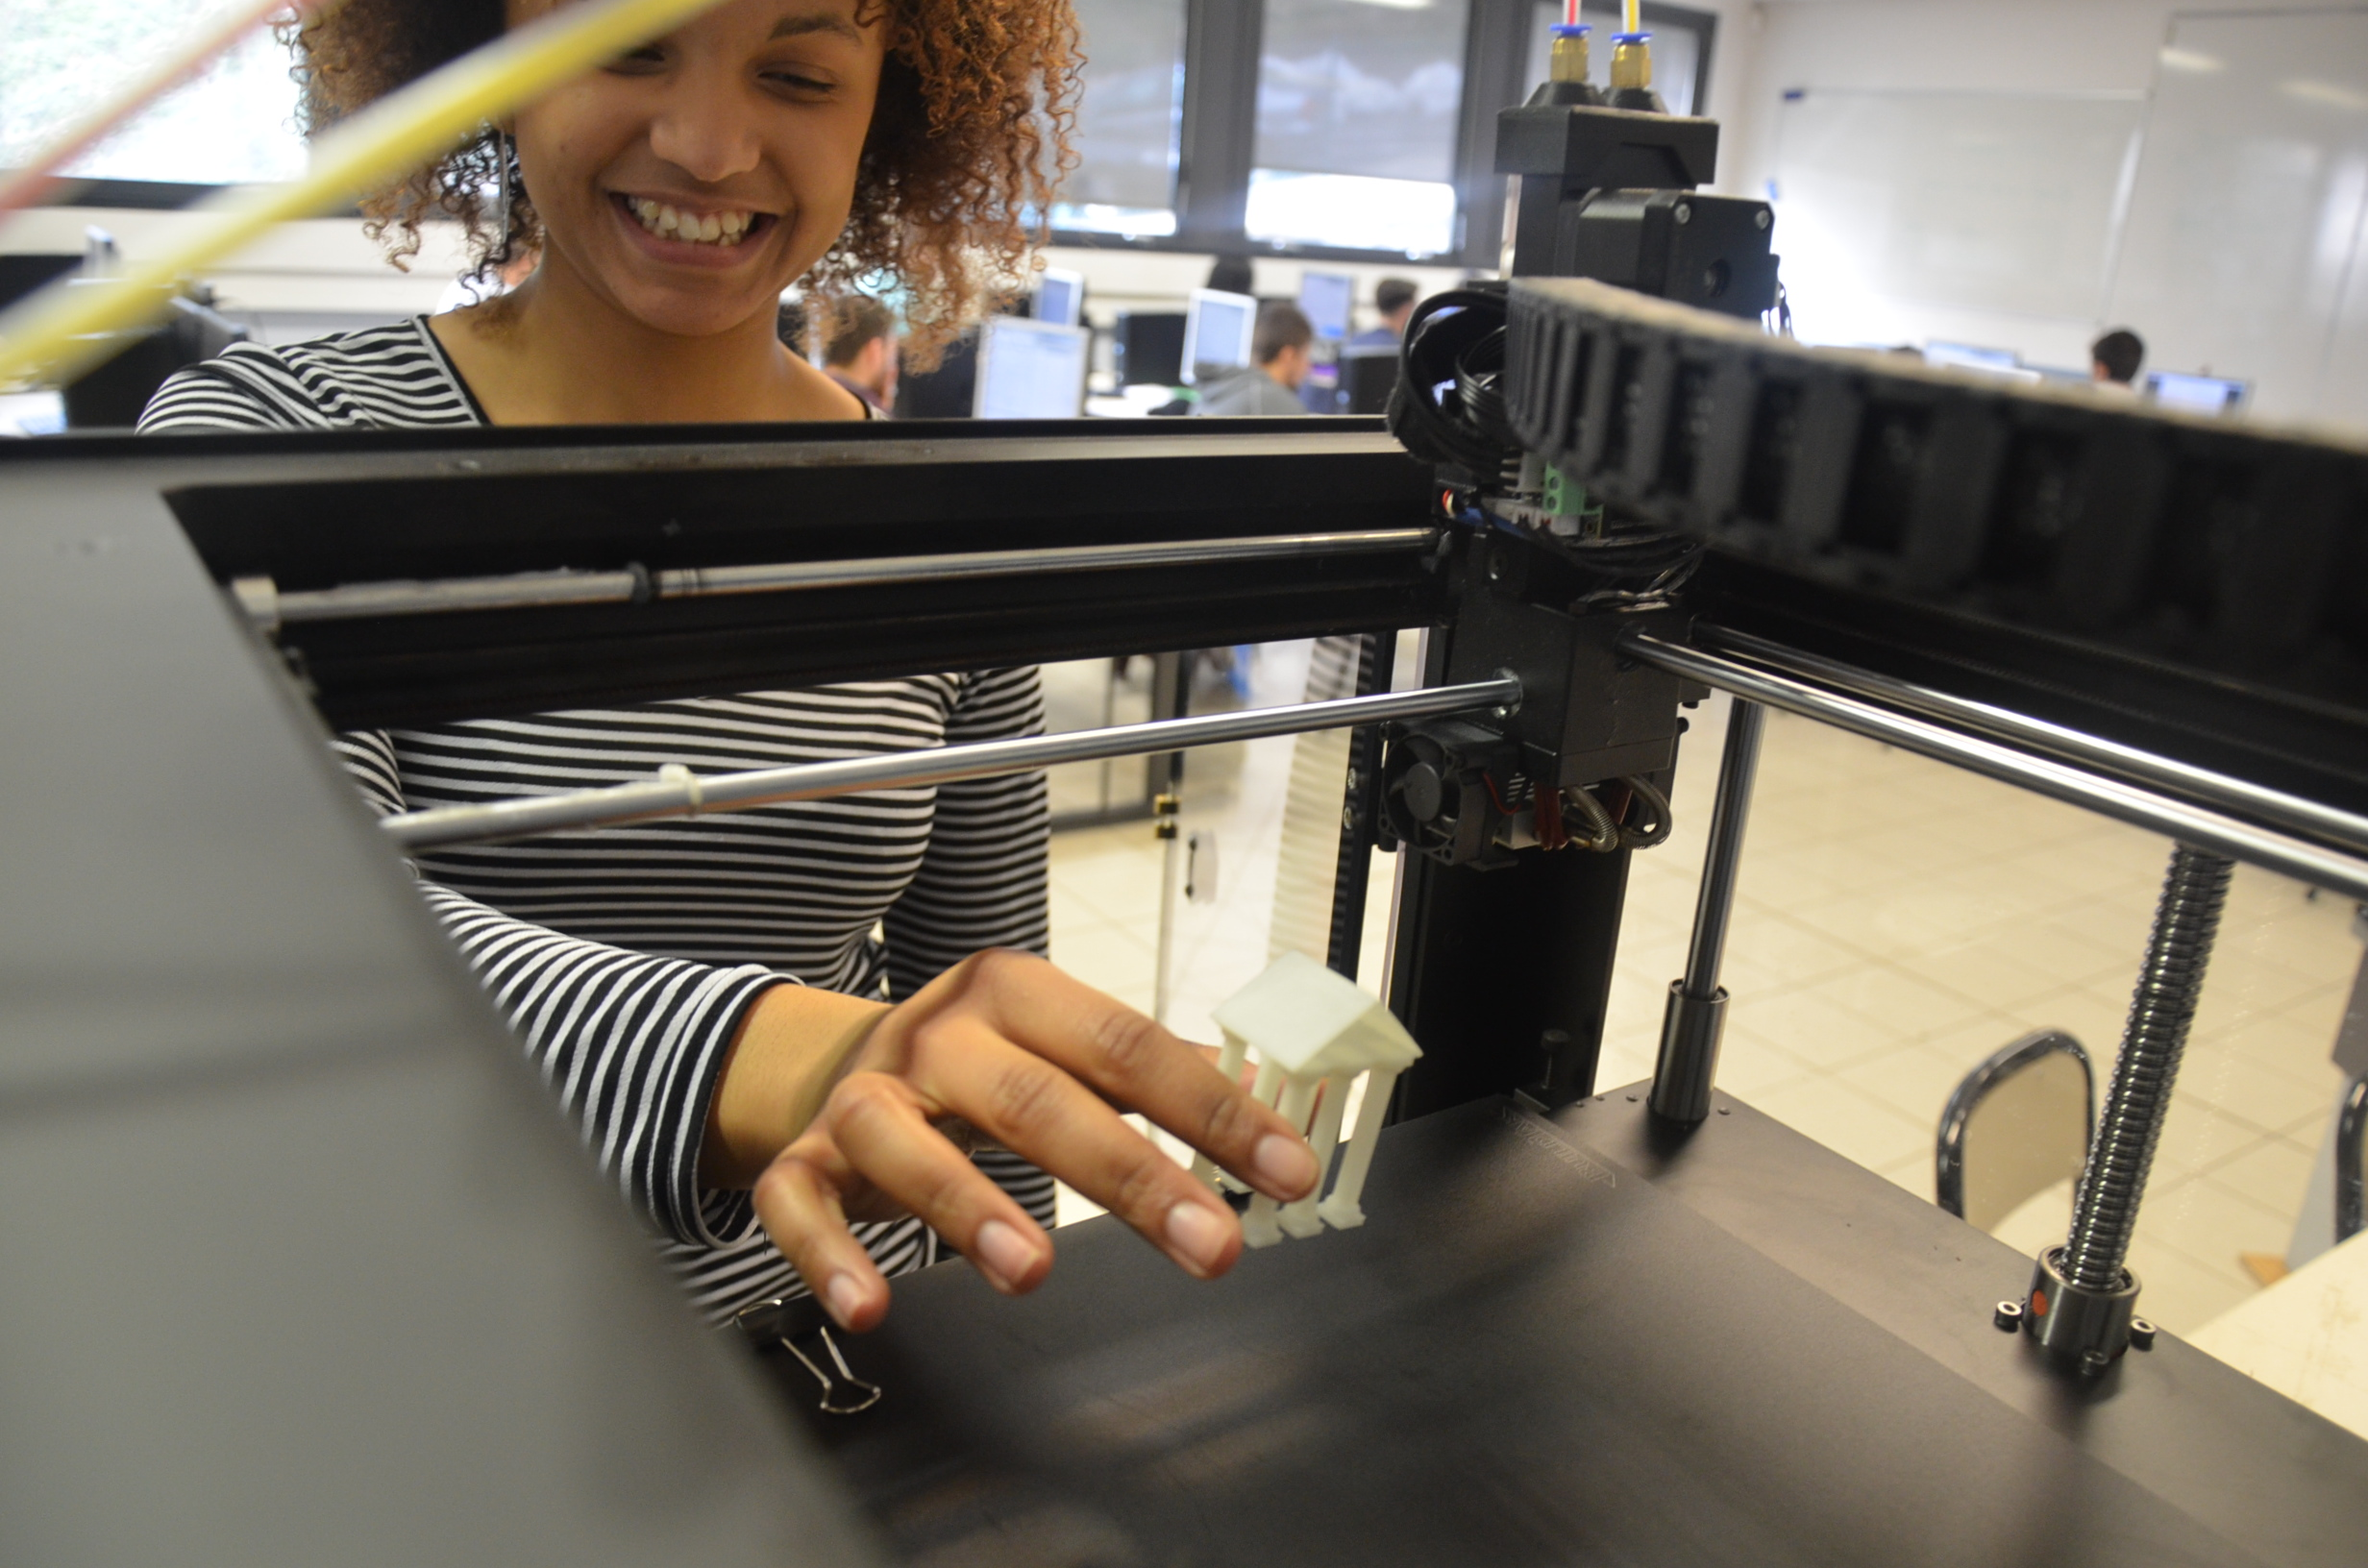 imprimante 3d ecole ingenieur